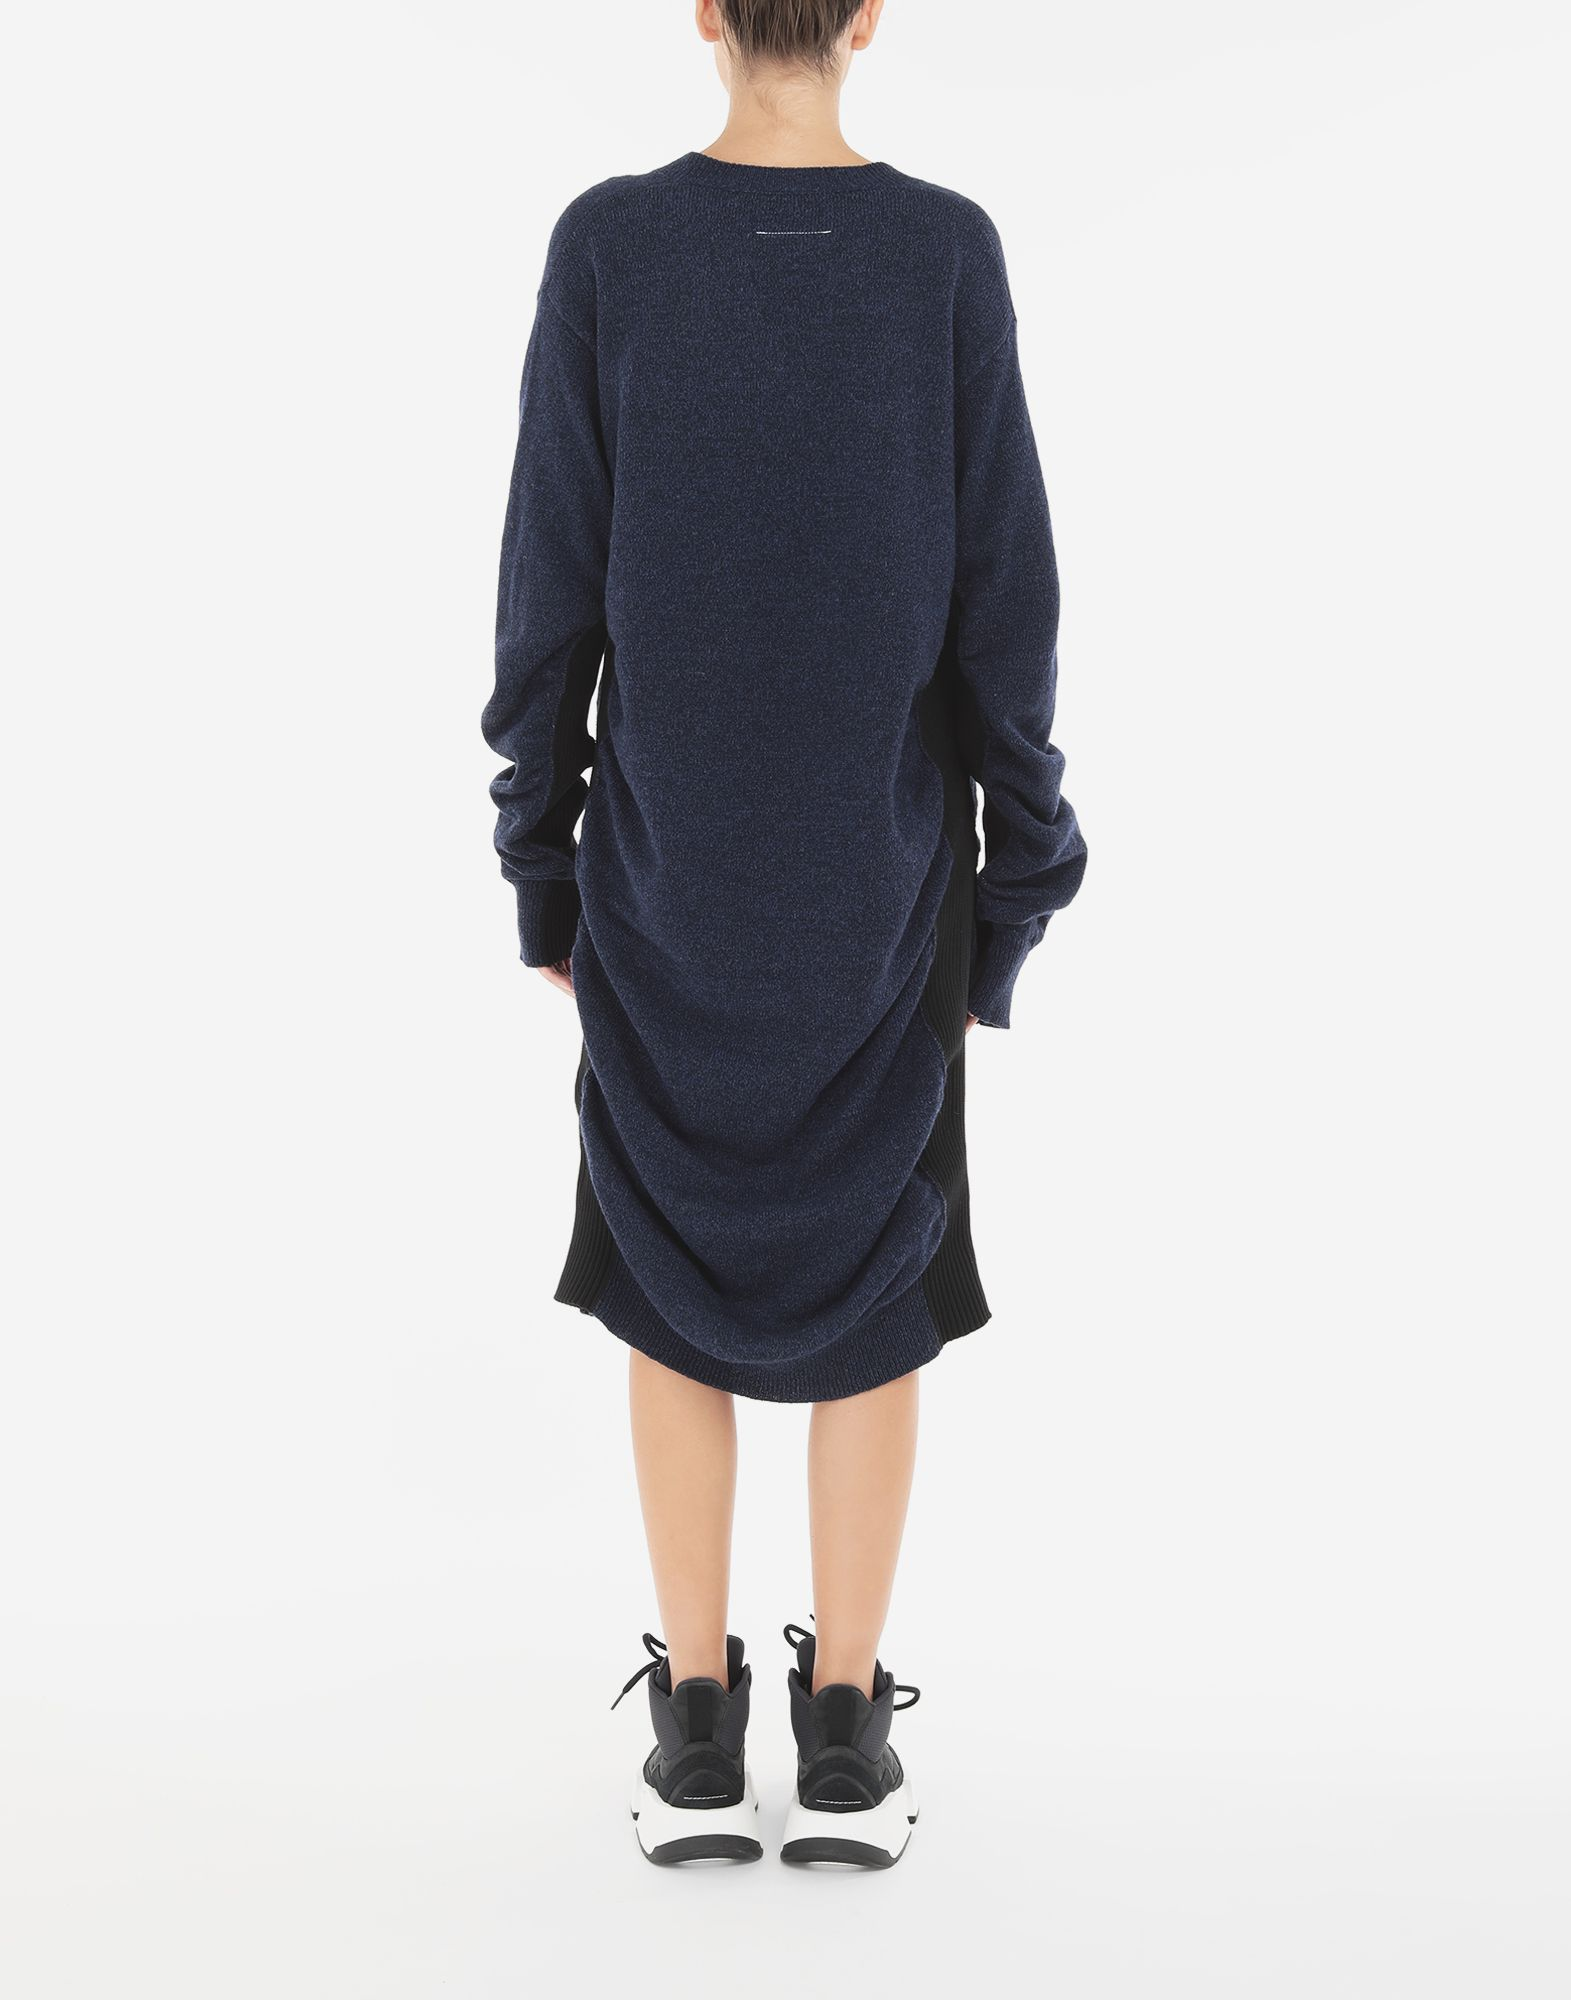 MM6 MAISON MARGIELA Ruched wool dress Dress Woman e